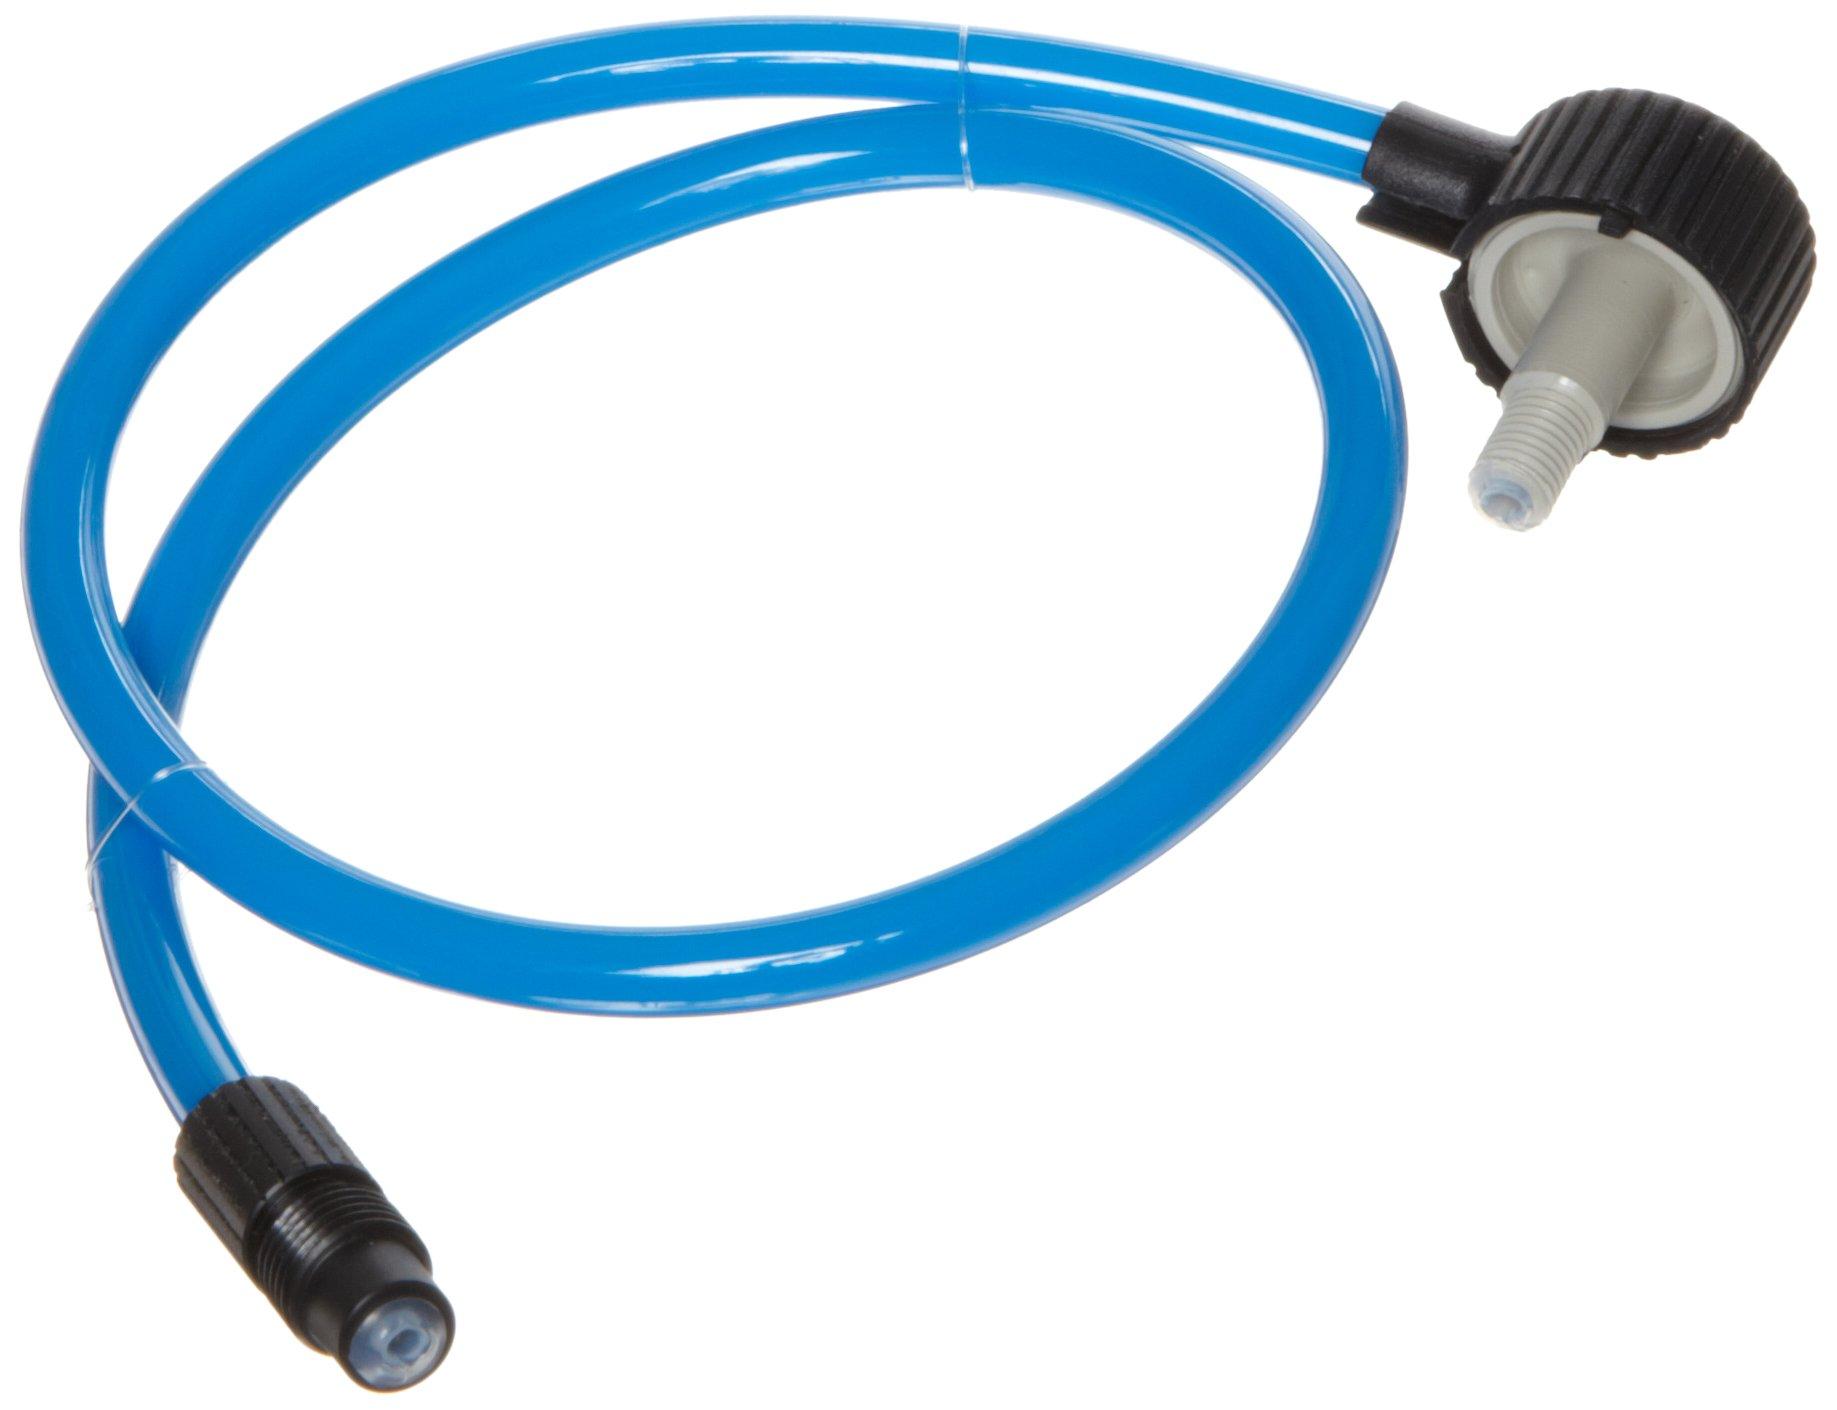 Hanna Instruments HI900570 Aspiration Tubing, For HI903 Karl Fischer Volumetric Titrator